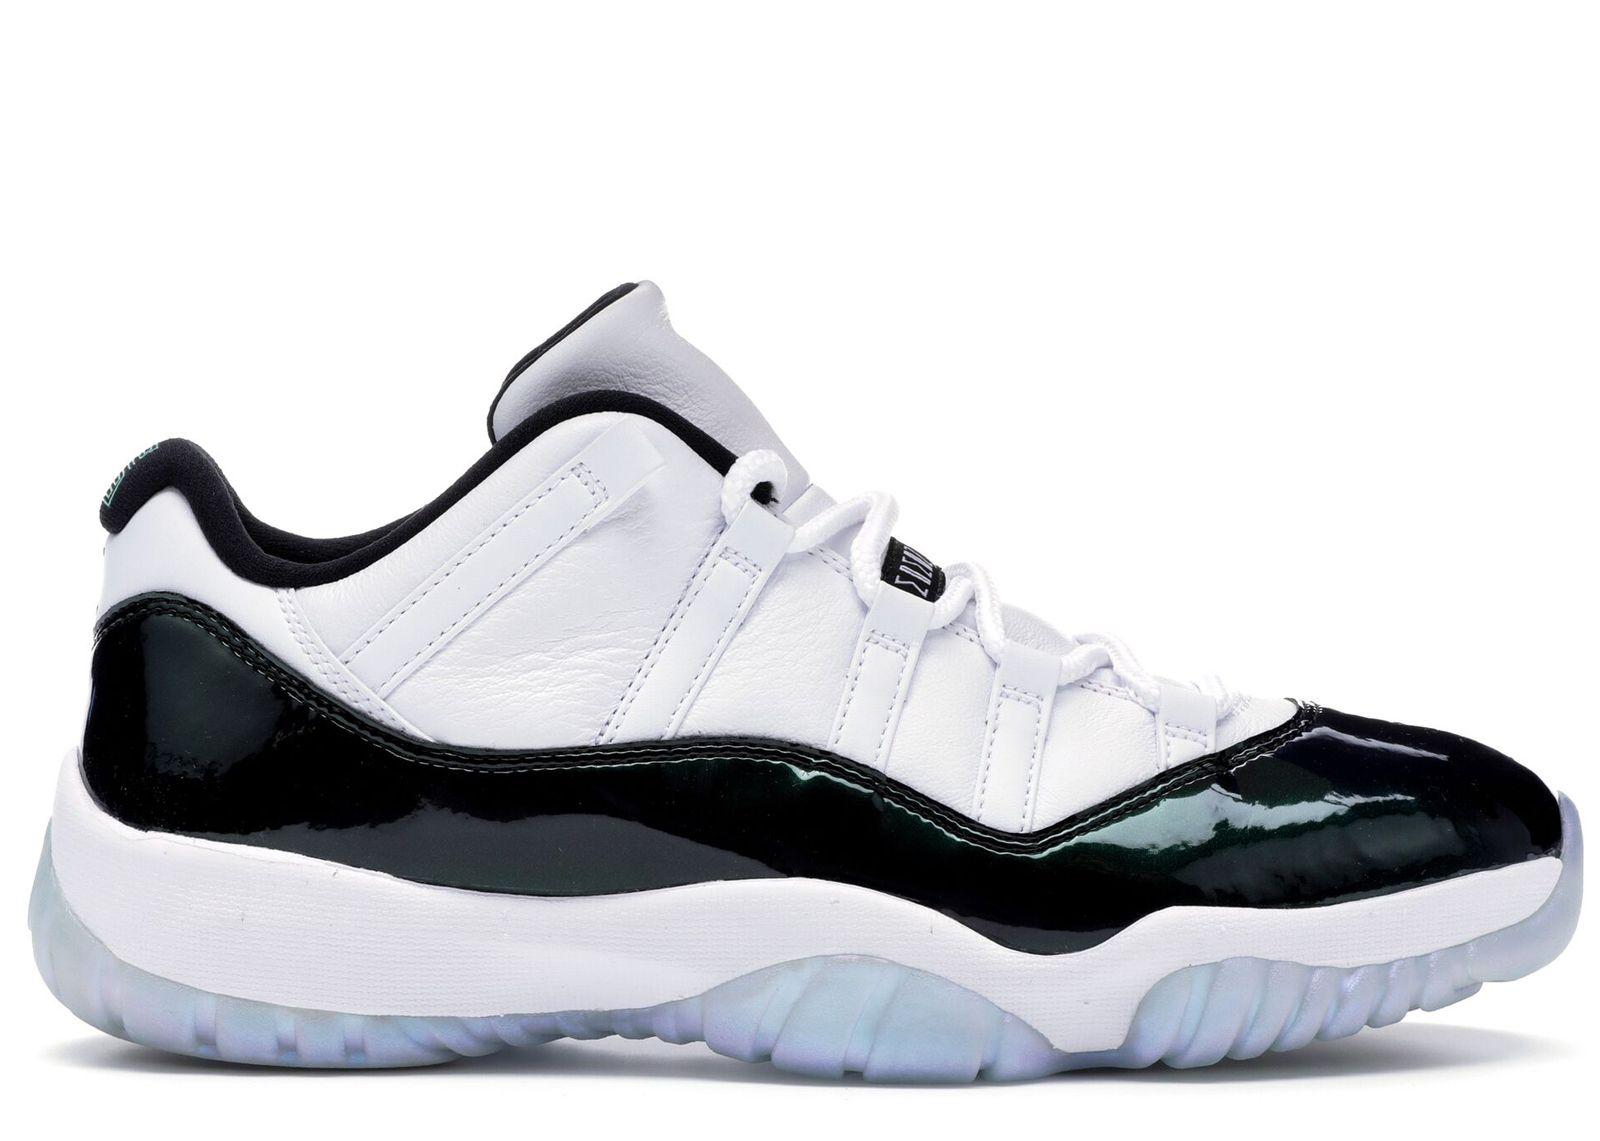 Jordan 11 Retro Low Iridescent Jordan Shoes Jordan 11 Jordan Retro 11 Low Jordan 11 Low Top